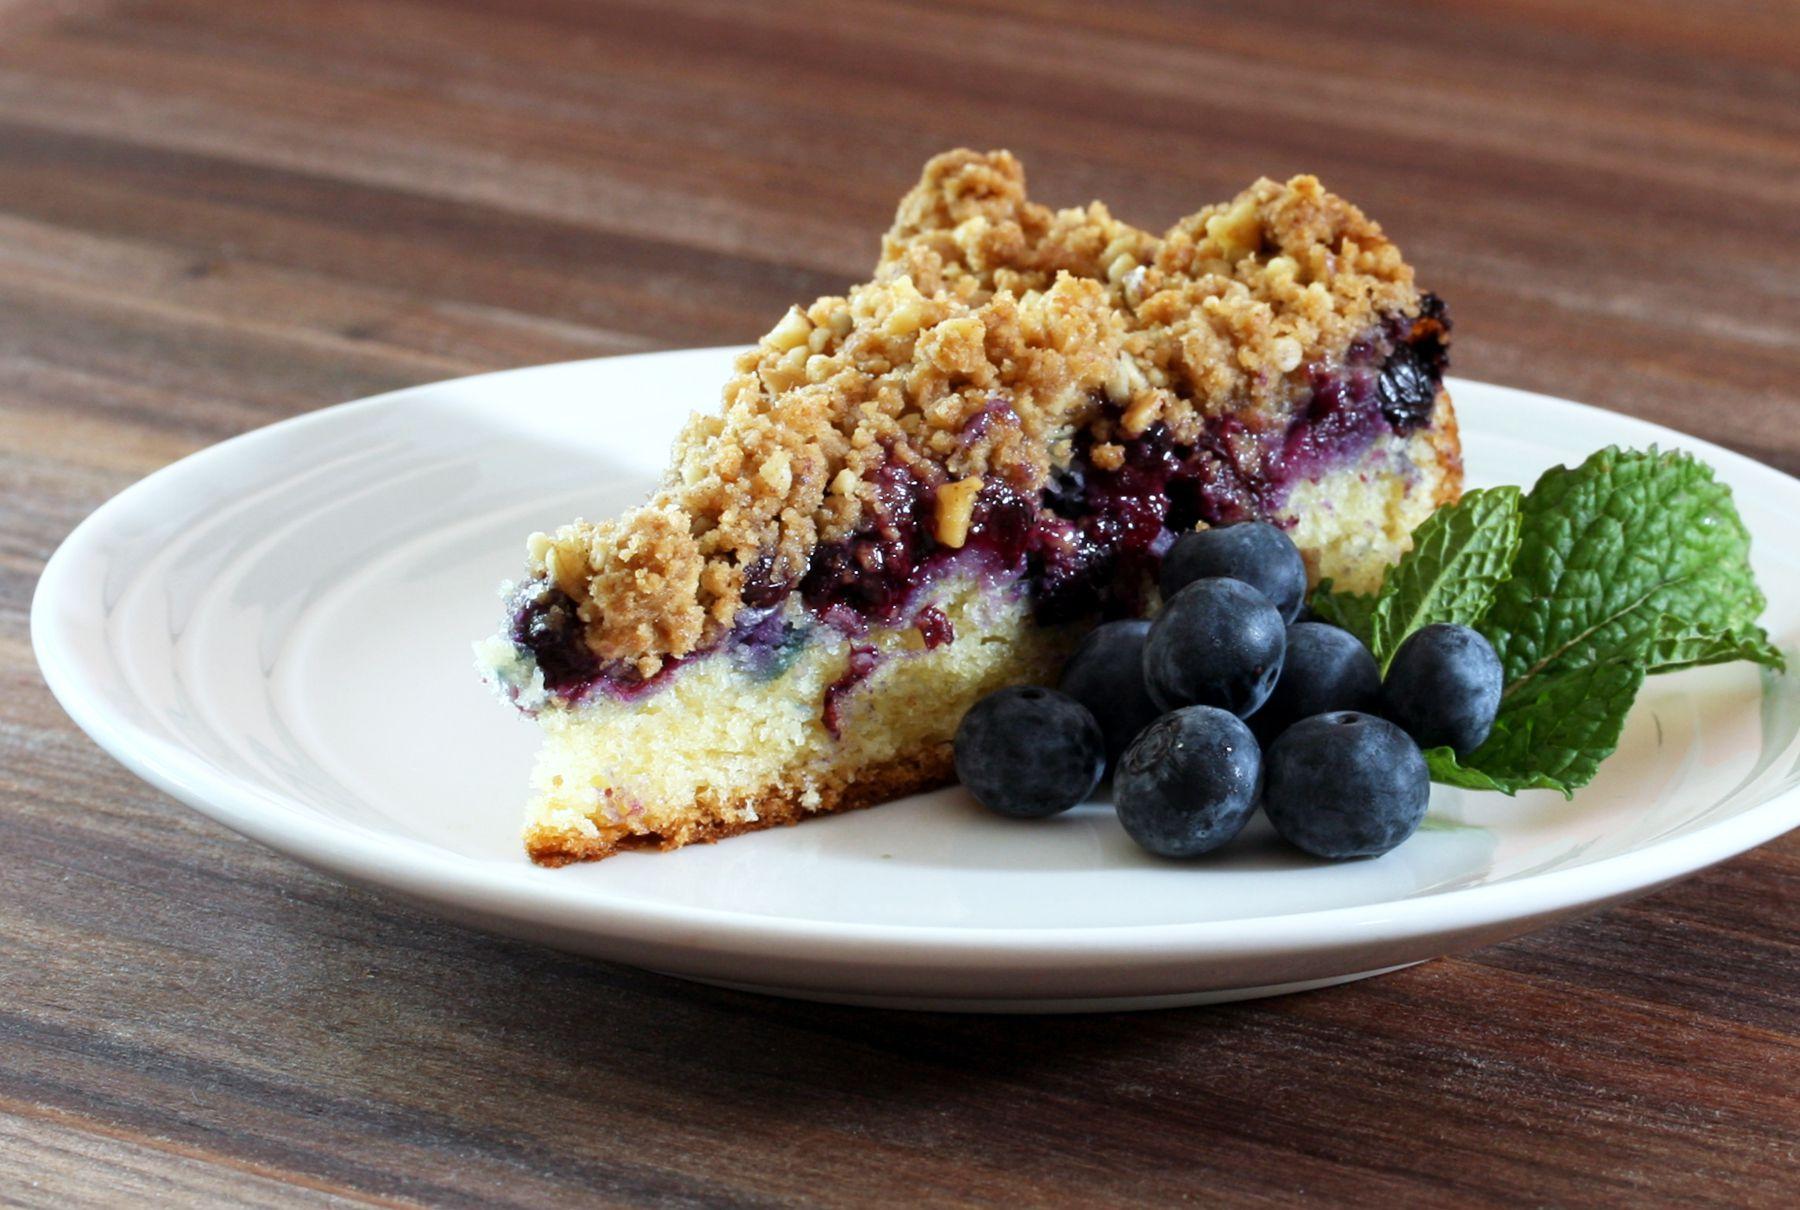 Blueberry Sour Cream Crumb Cake